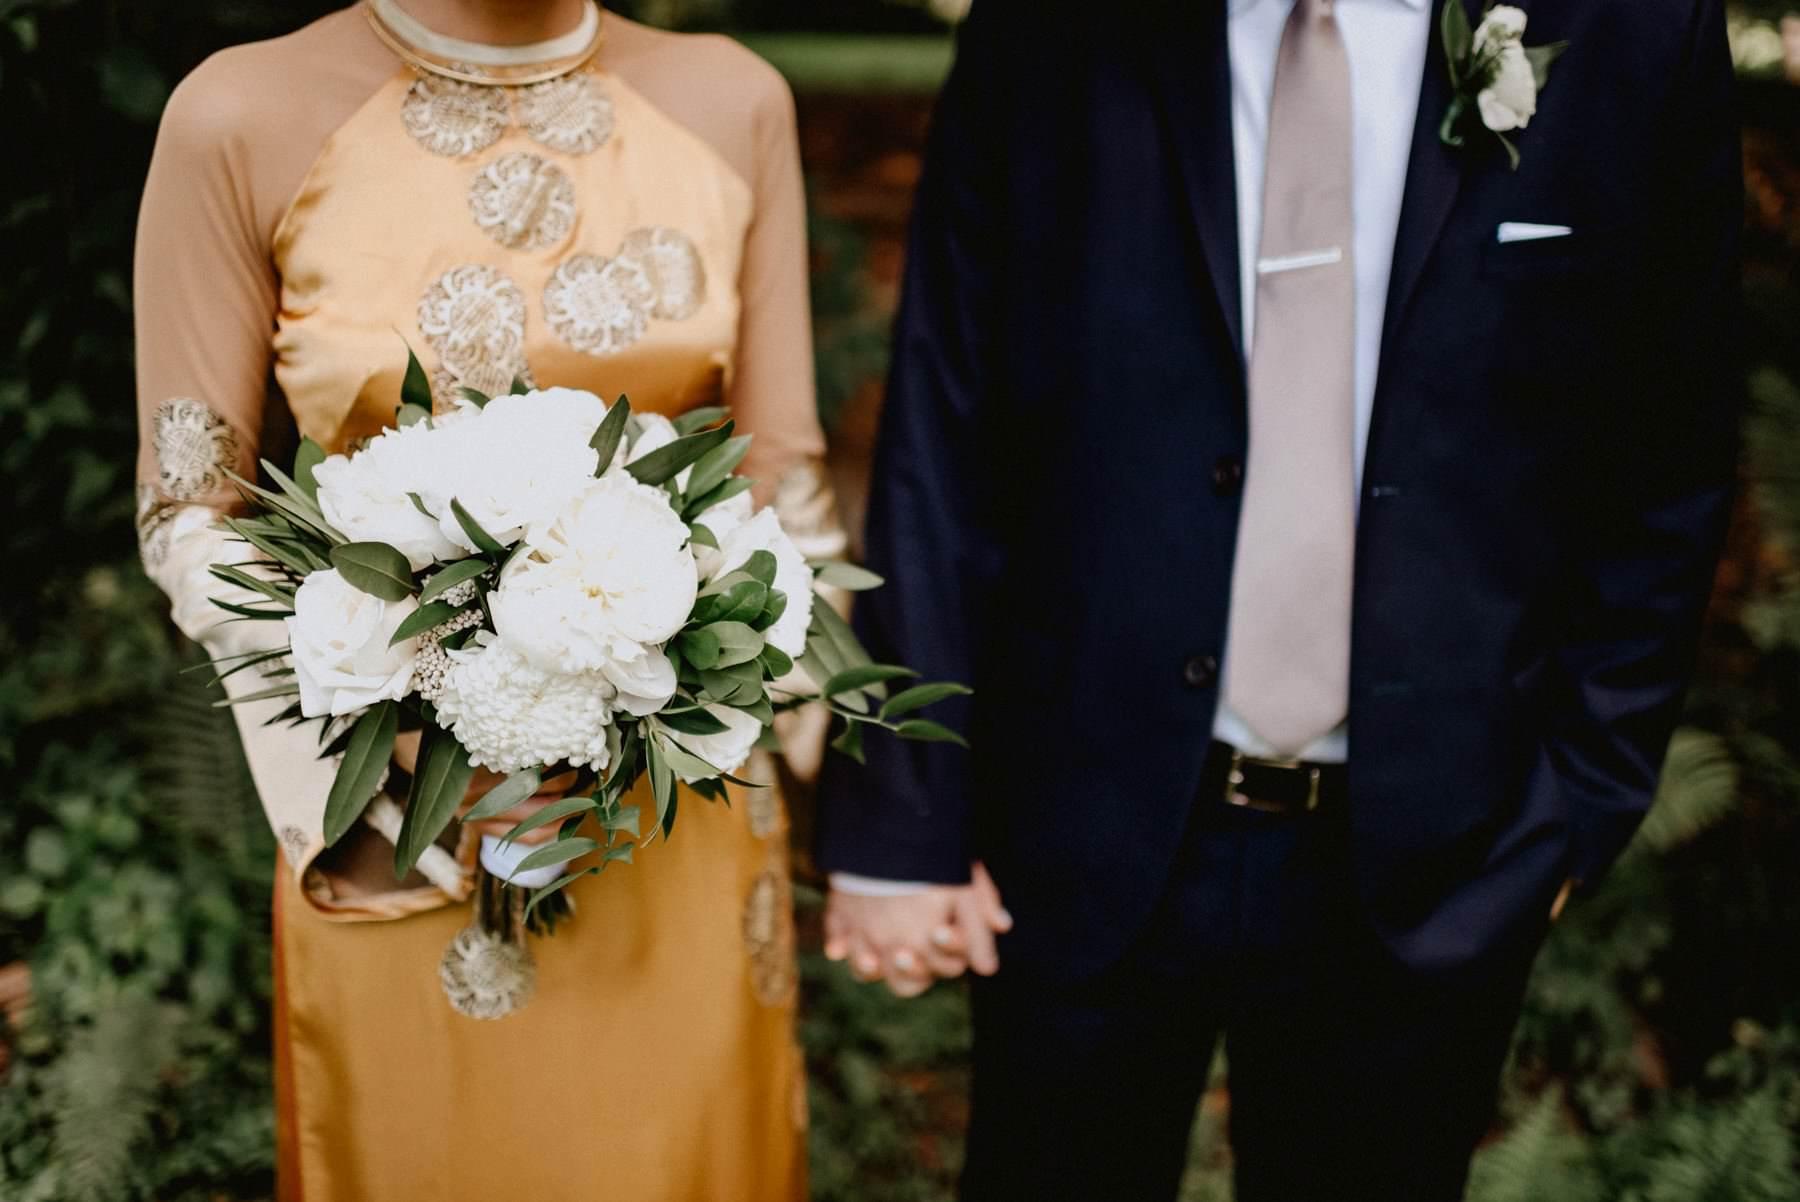 Appleford-estate-wedding-28.jpg